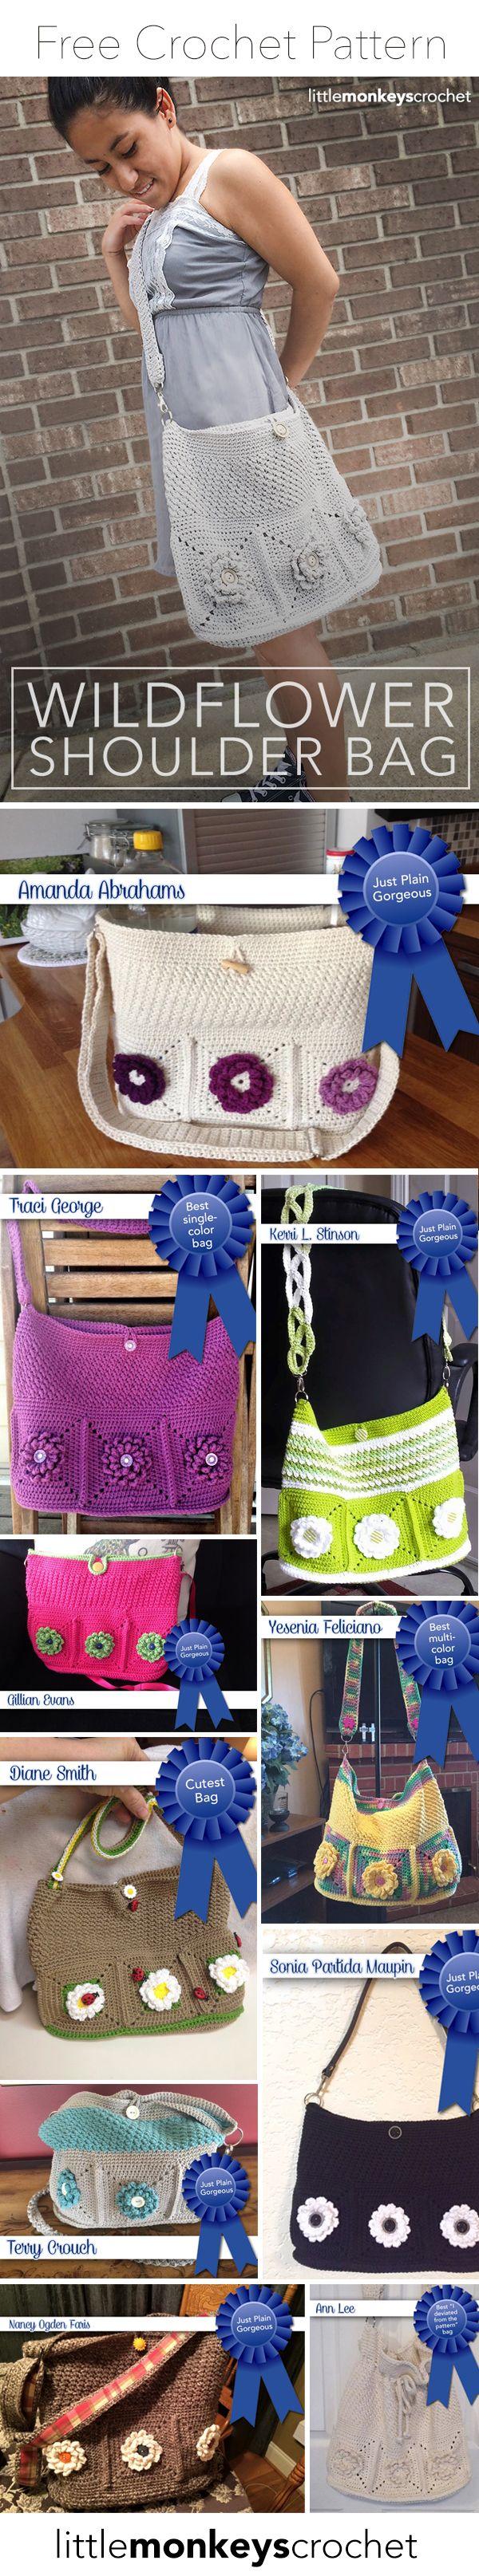 Wildflower Shoulder Bag Free Crochet Pattern - American Standard Terms, UK Terms, Dutch, German, Norwegian, Danish, French and Spanish Translations   Free Crochet Purse Pattern by Little Monkeys Crochet